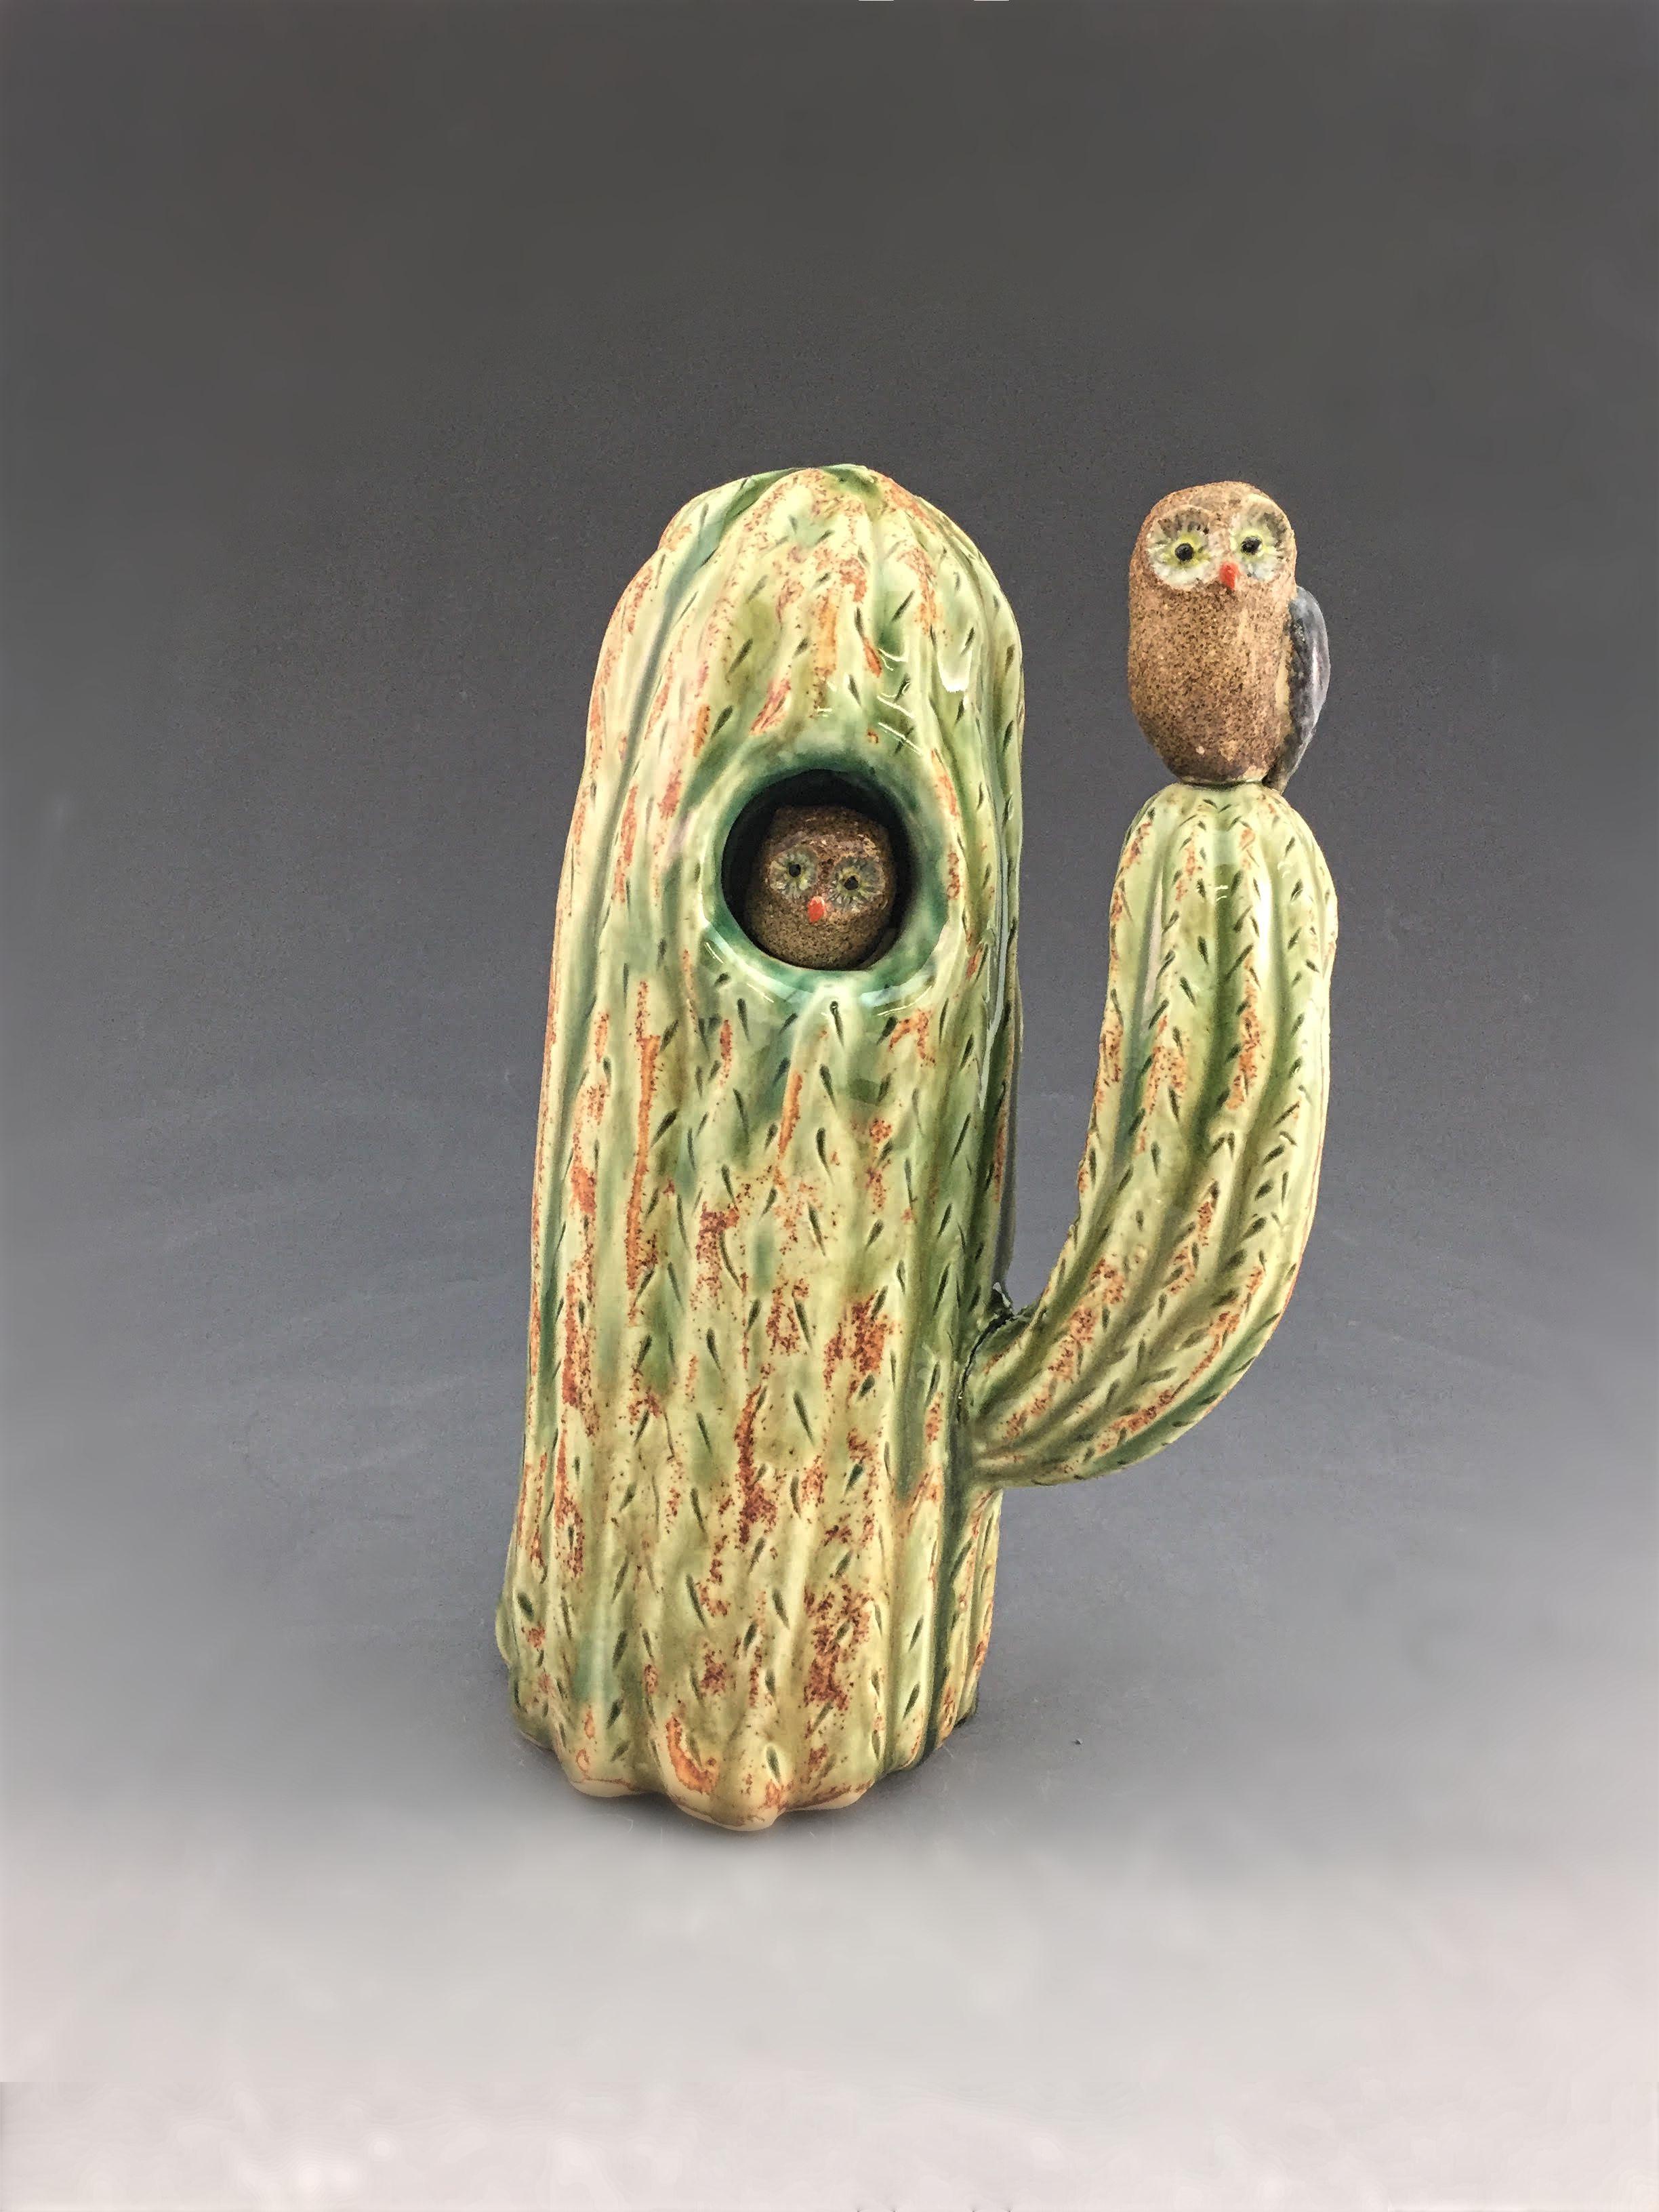 A Prickly Pair